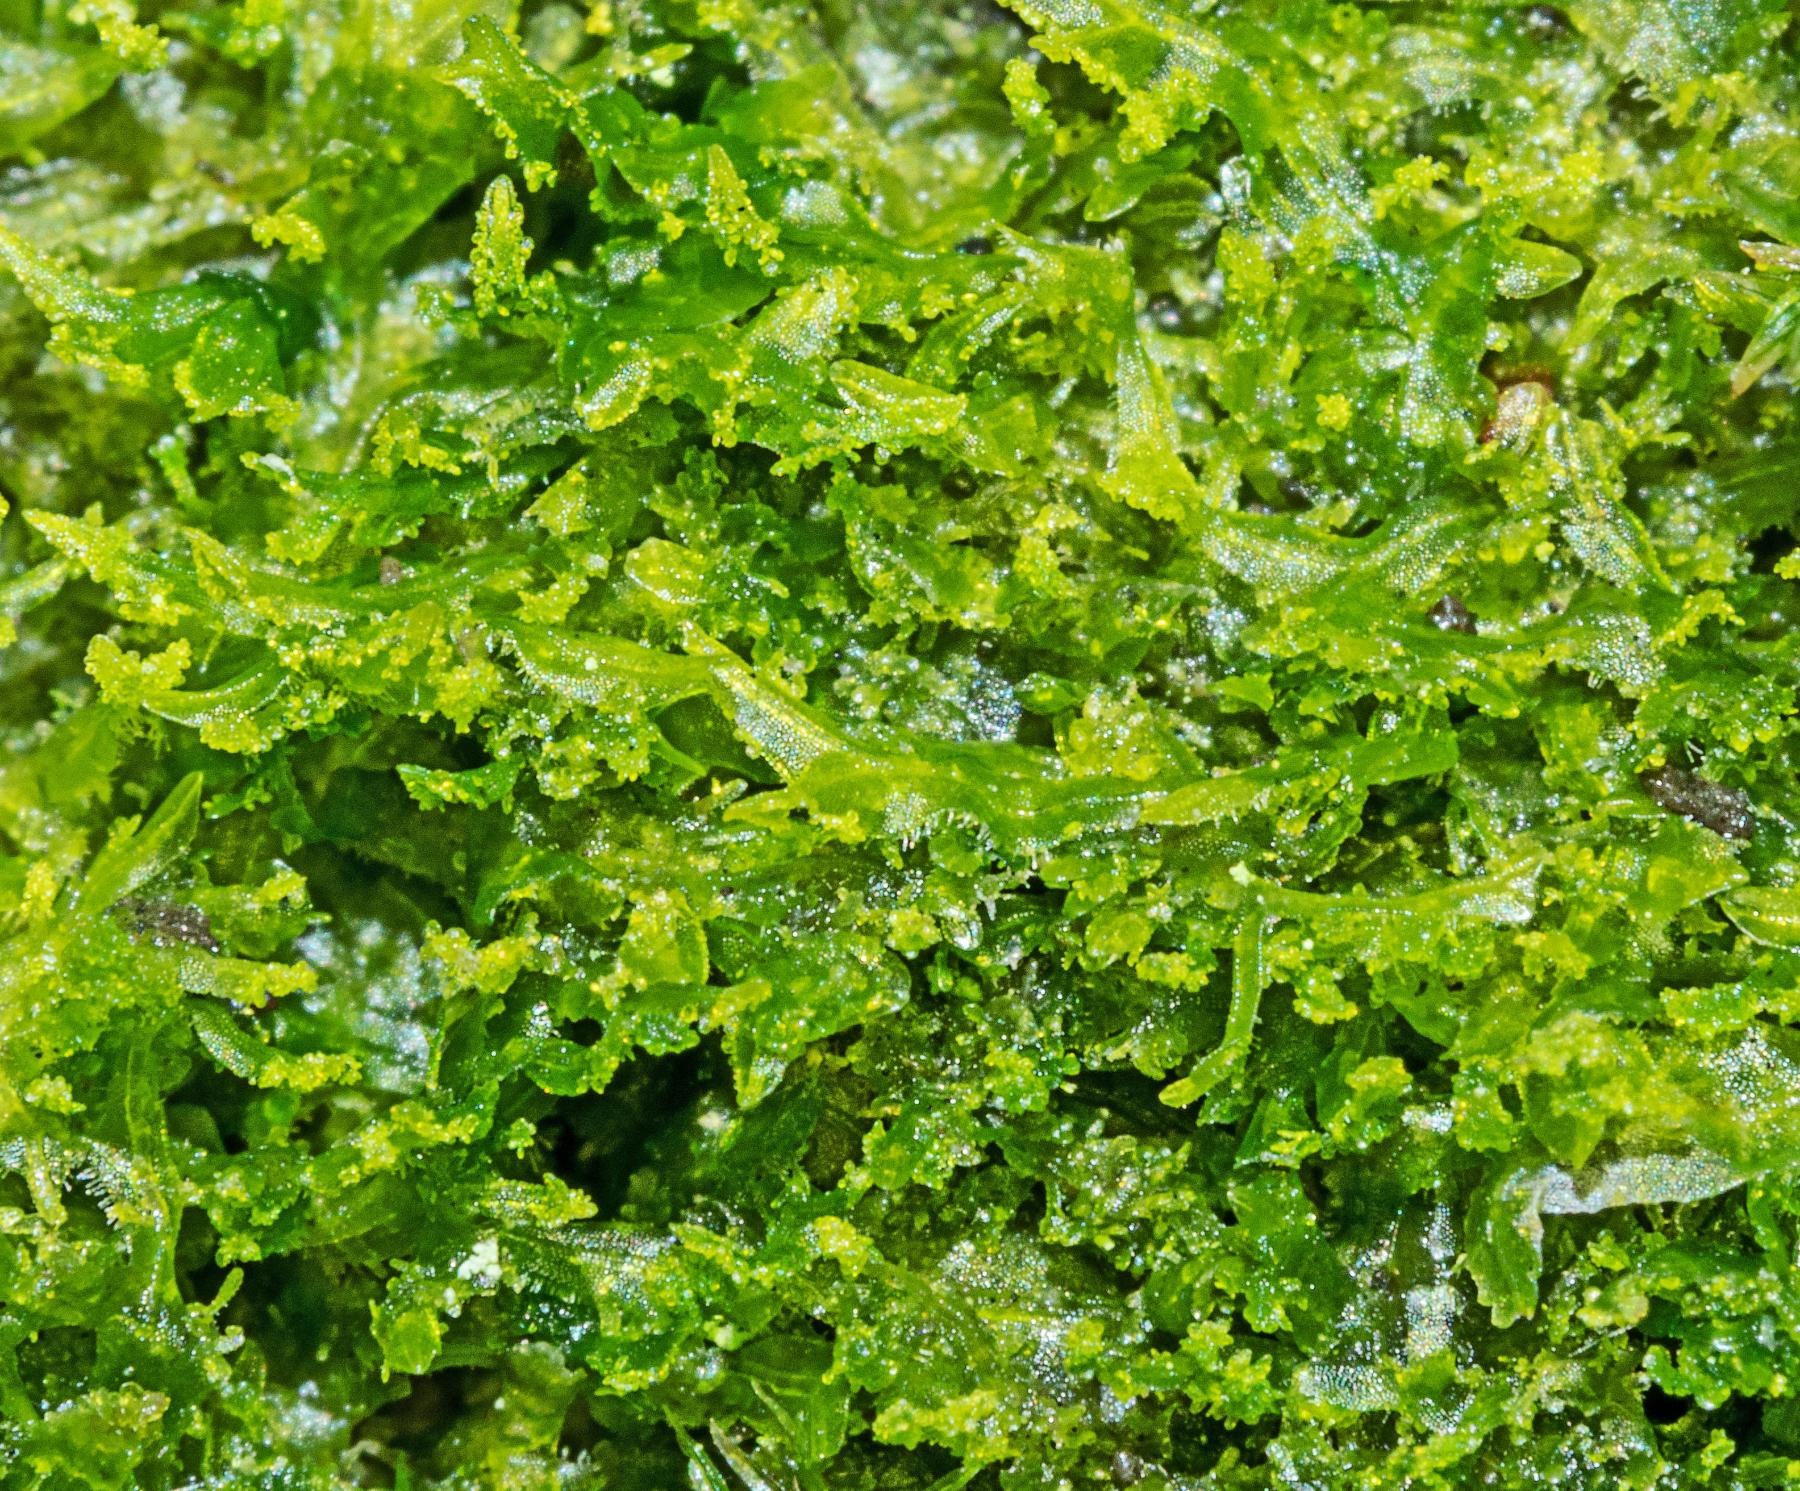 Whiskered Veilwort Metzgeria consanguinea